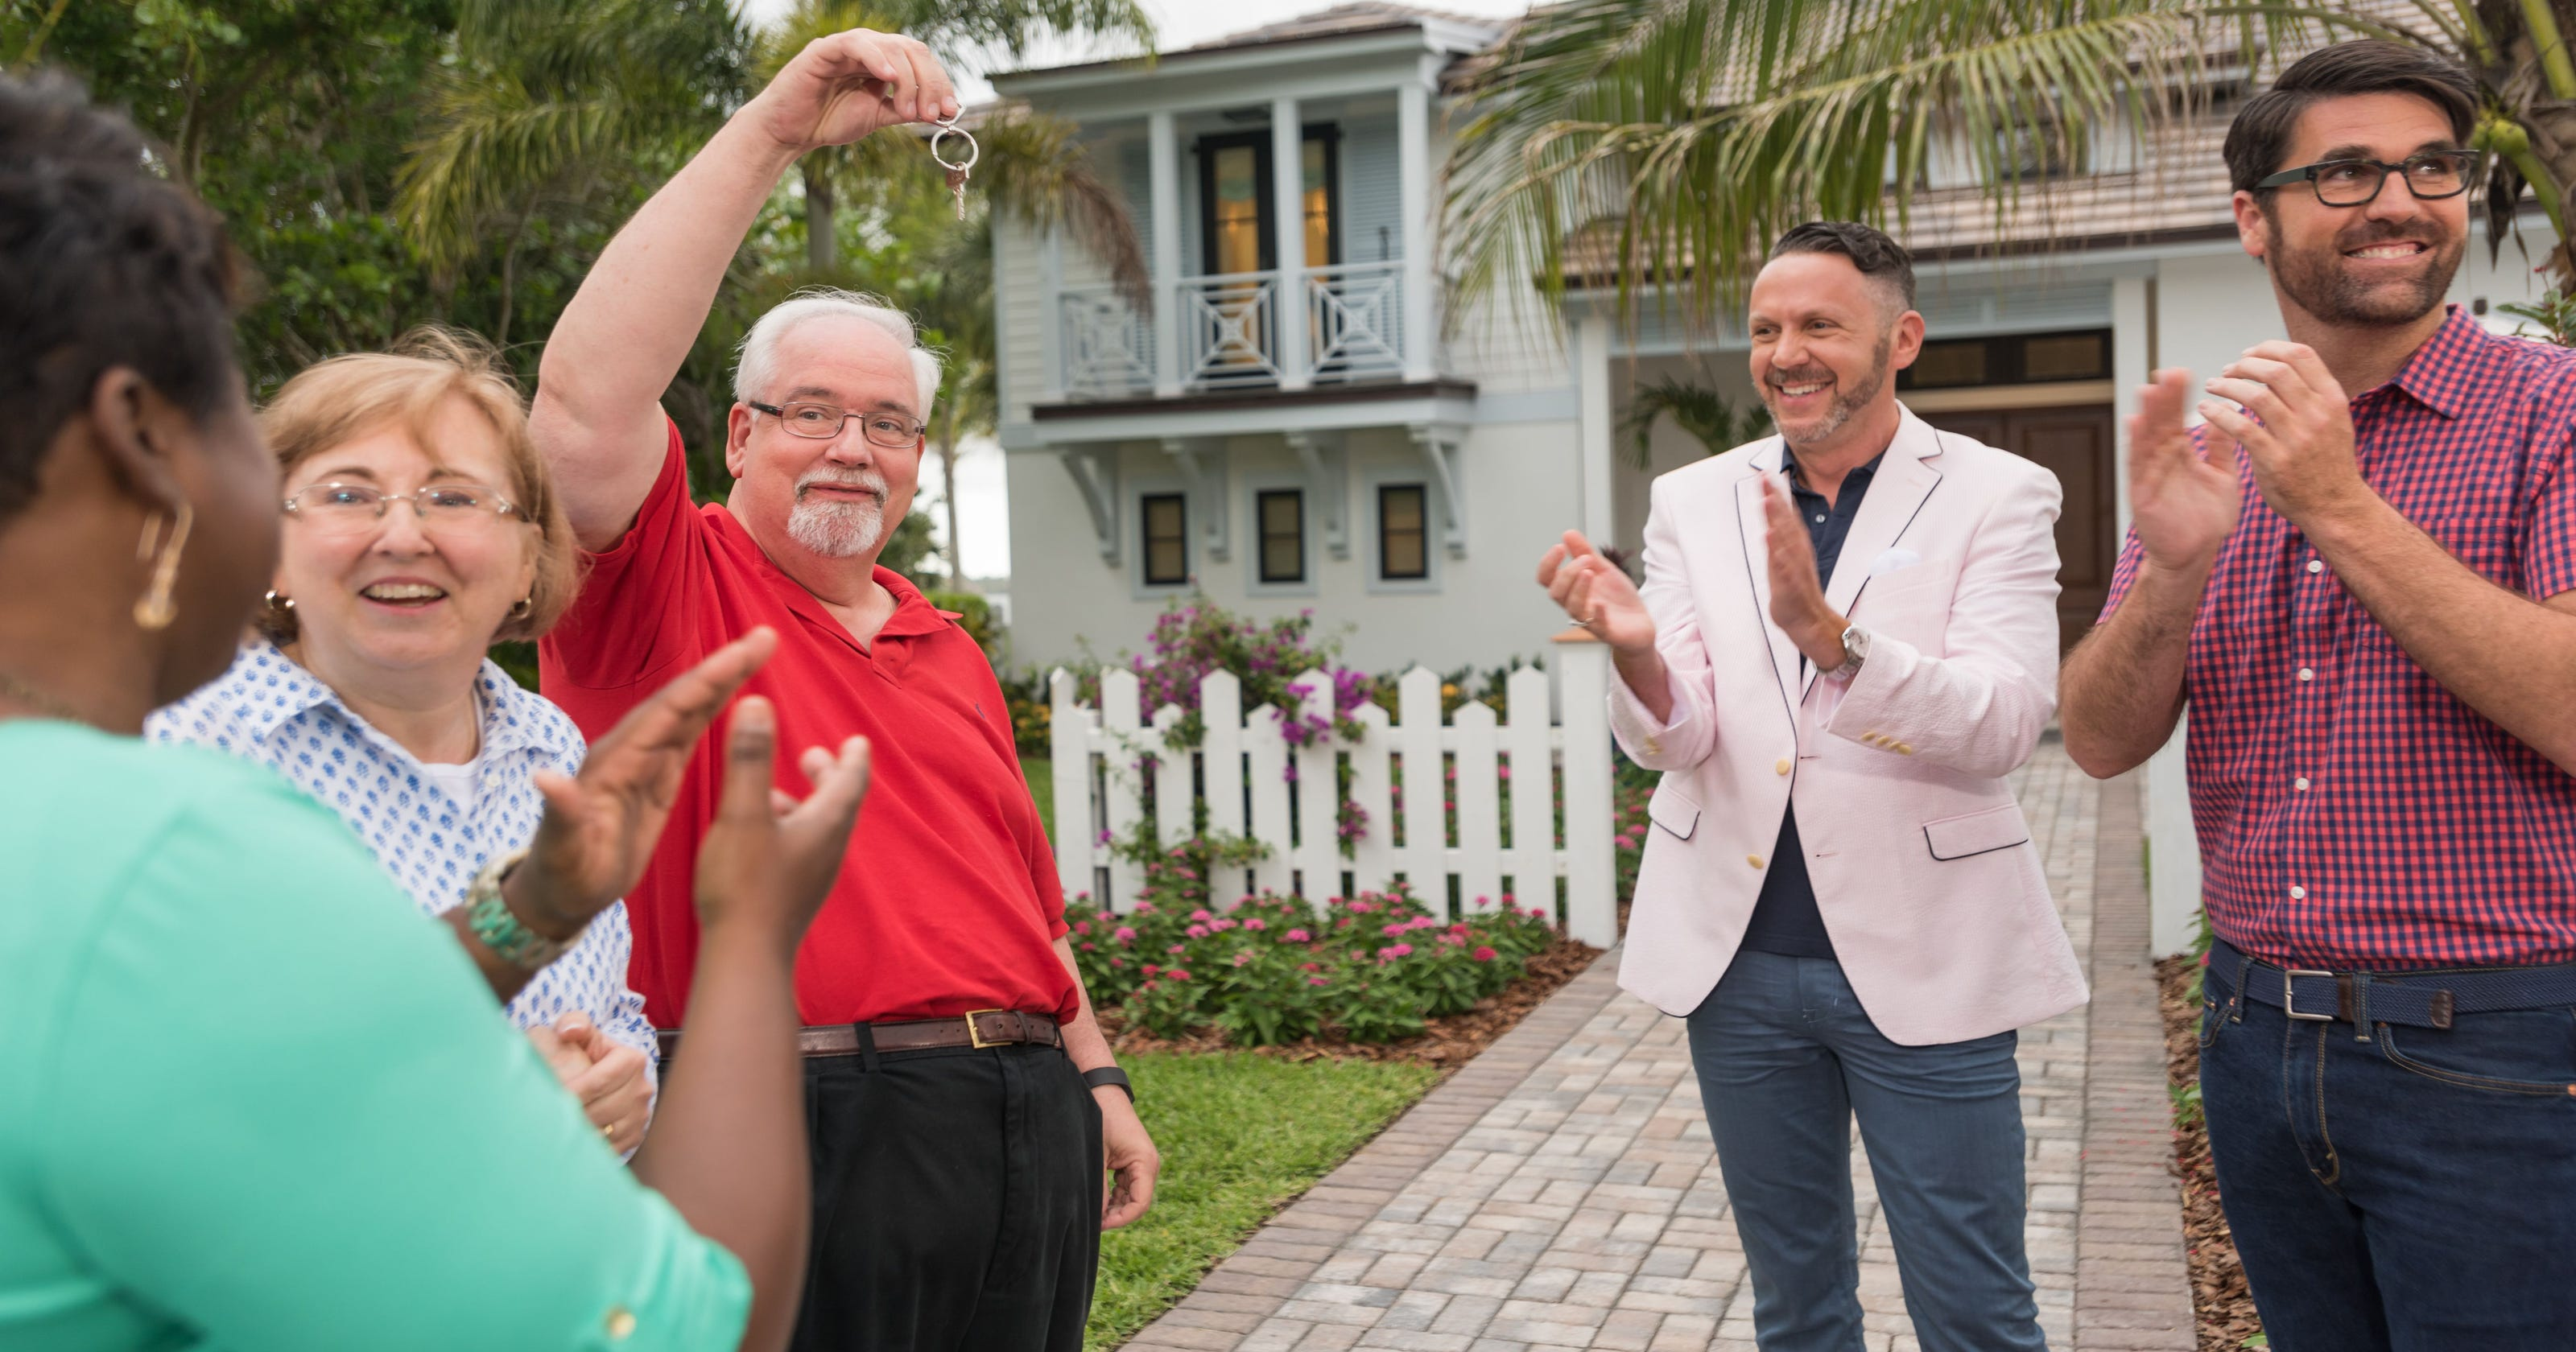 HGTV Dream Home: Yay or nay?